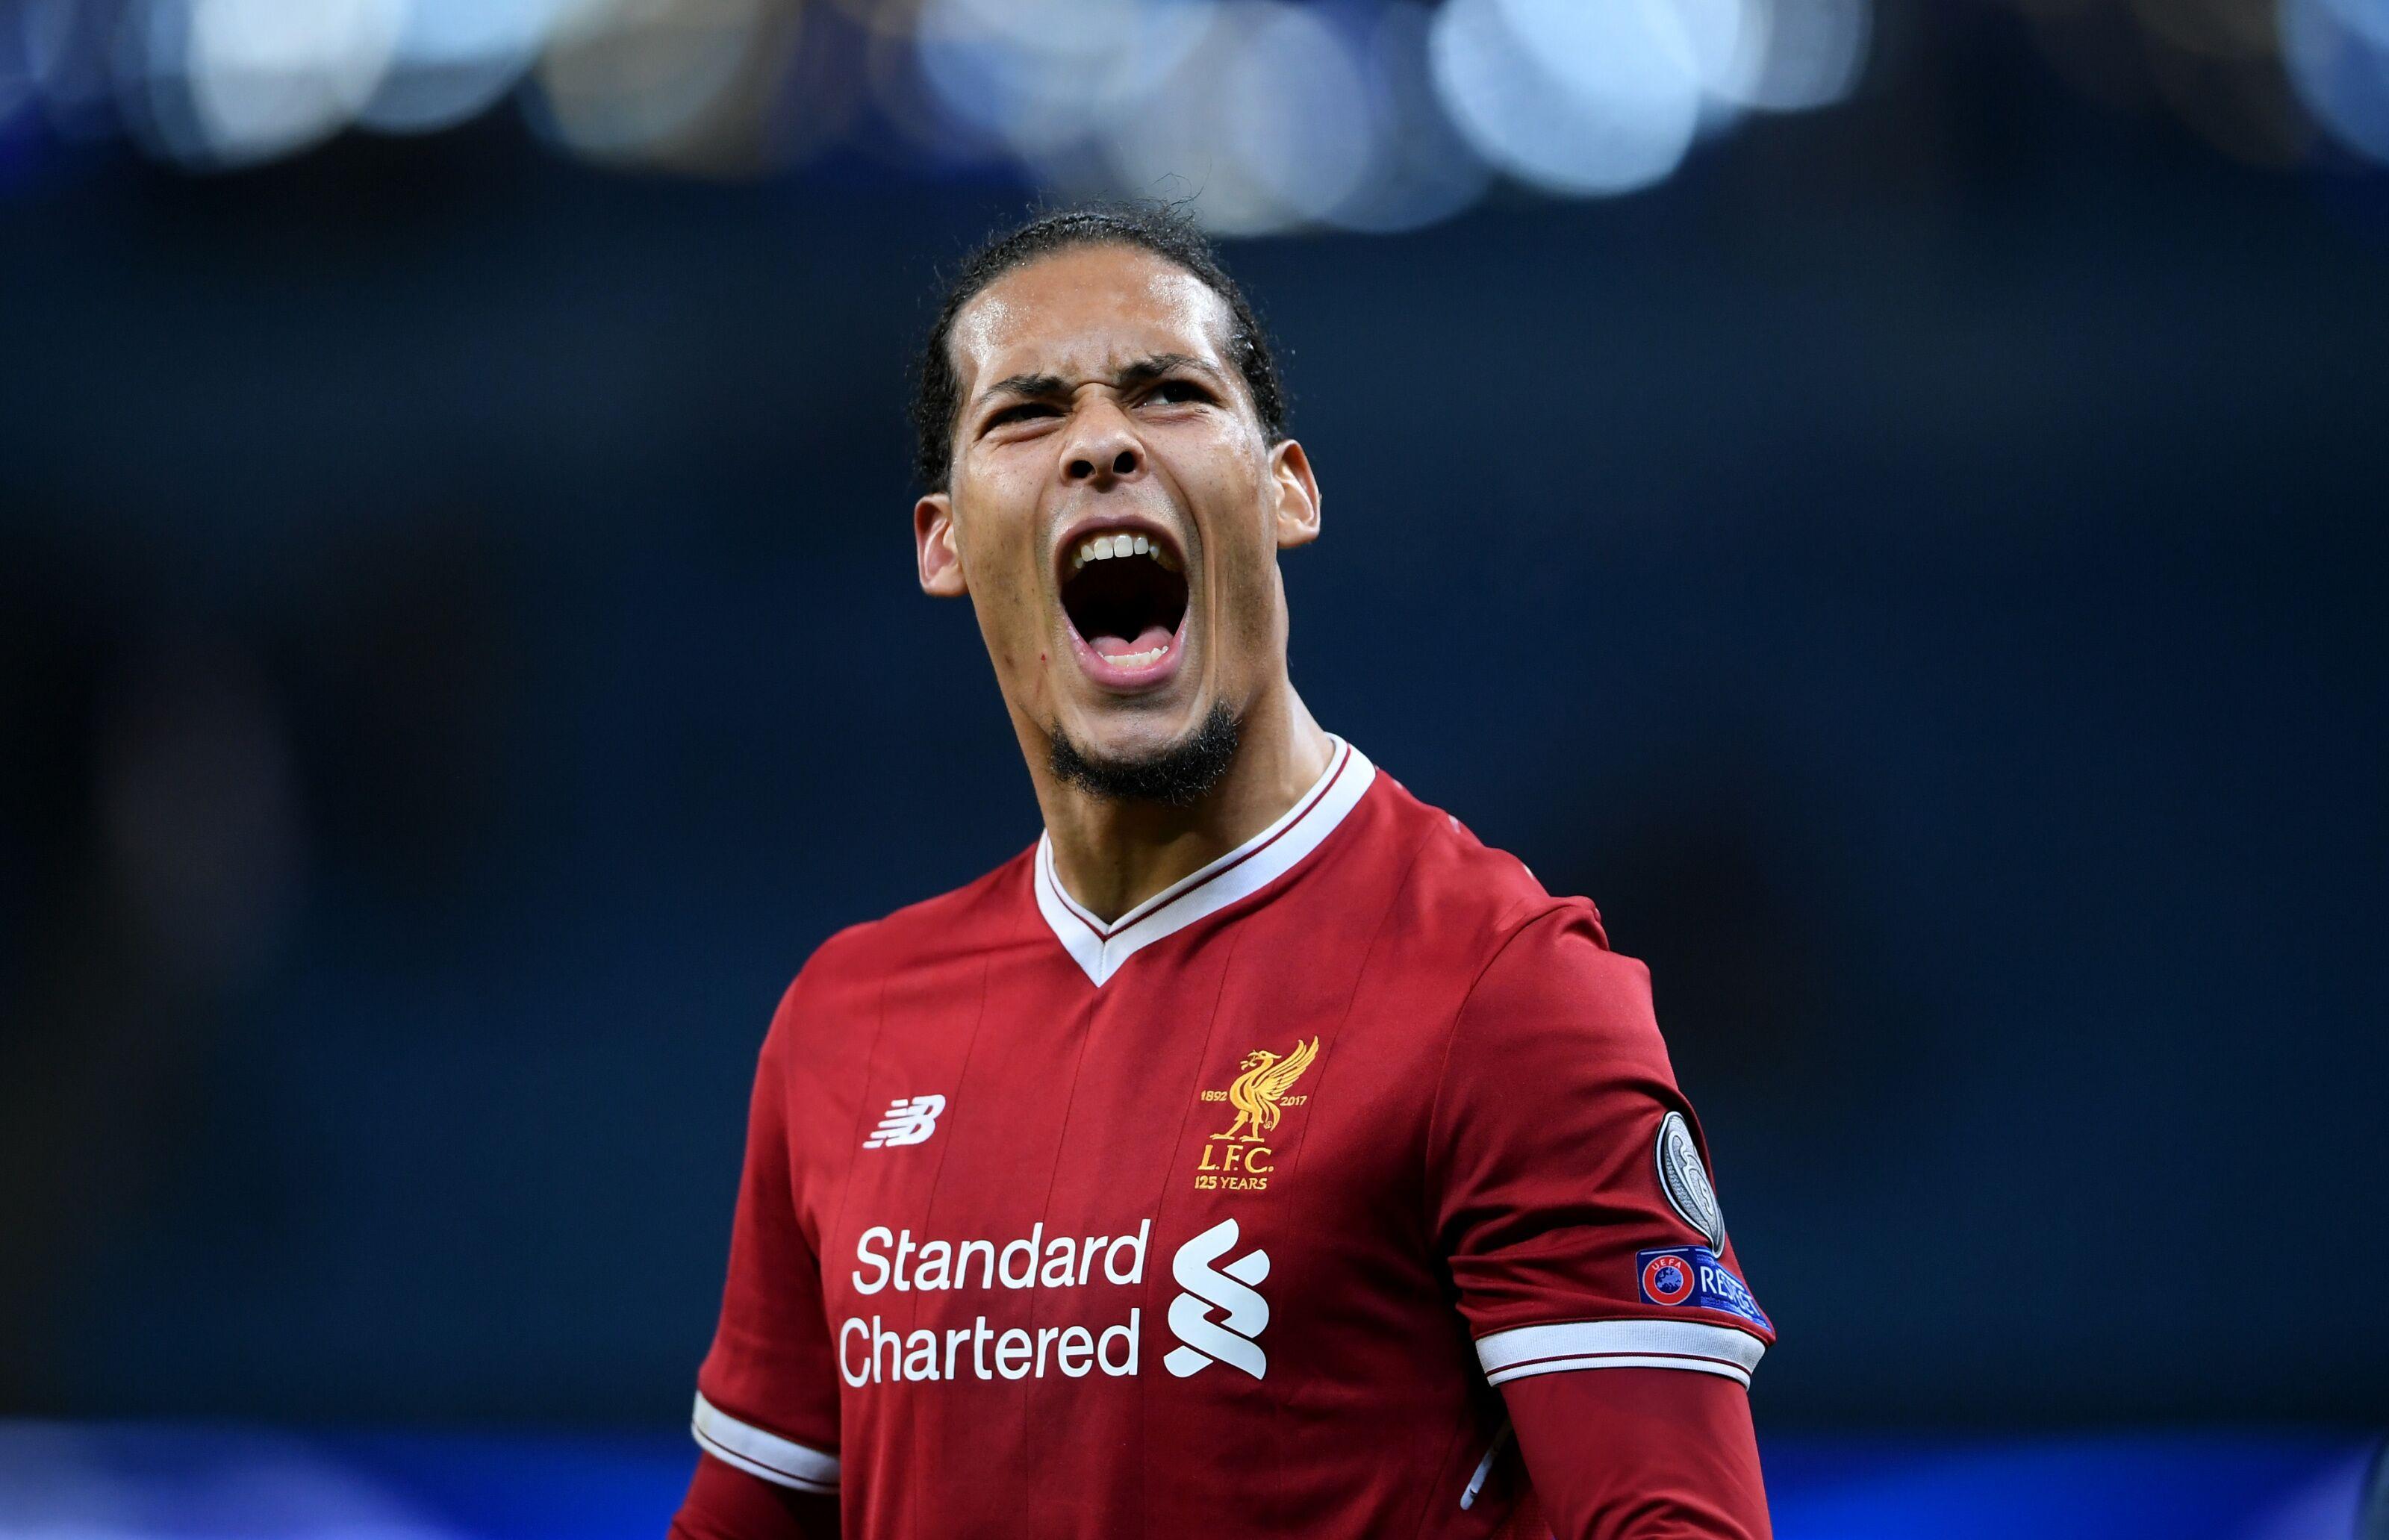 Van Dijk Has Real Potential To Be Liverpool's New Captain